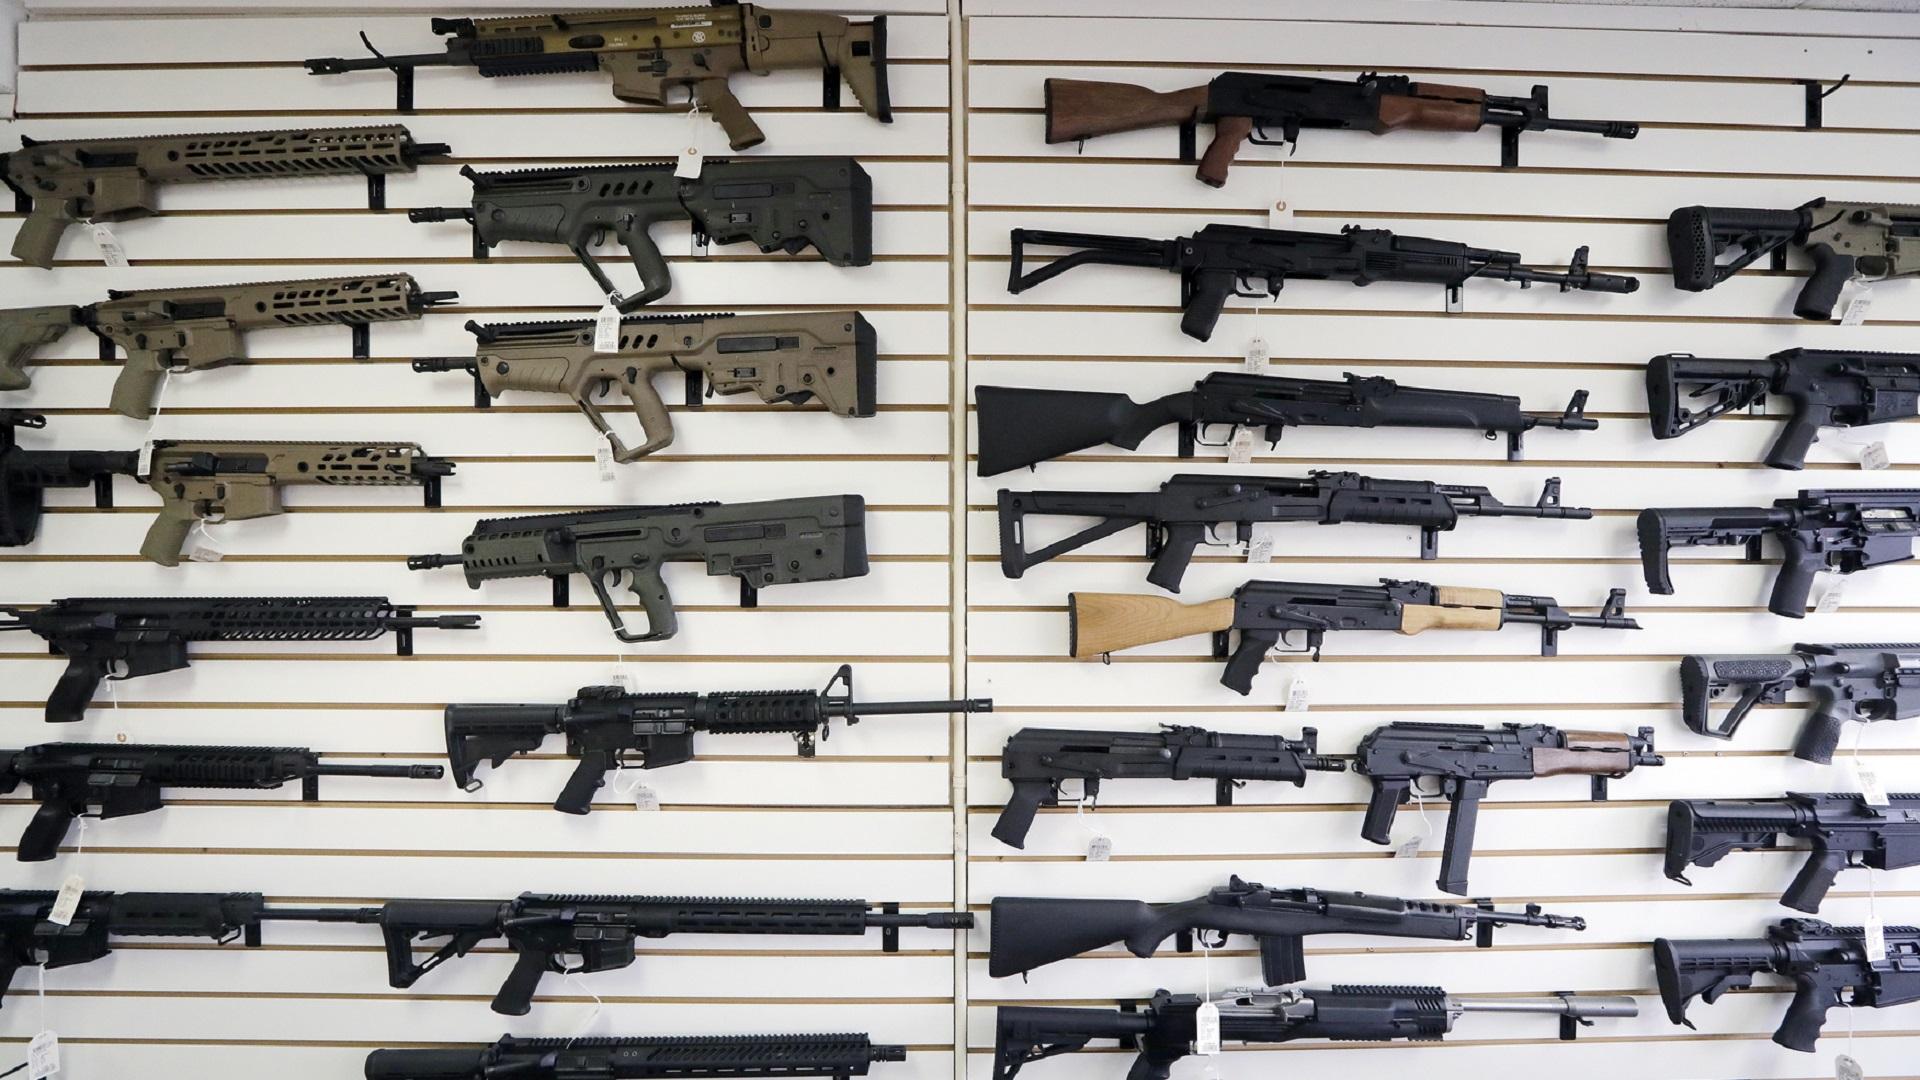 SEMI-AUTOMATIC RIFLES GUNS